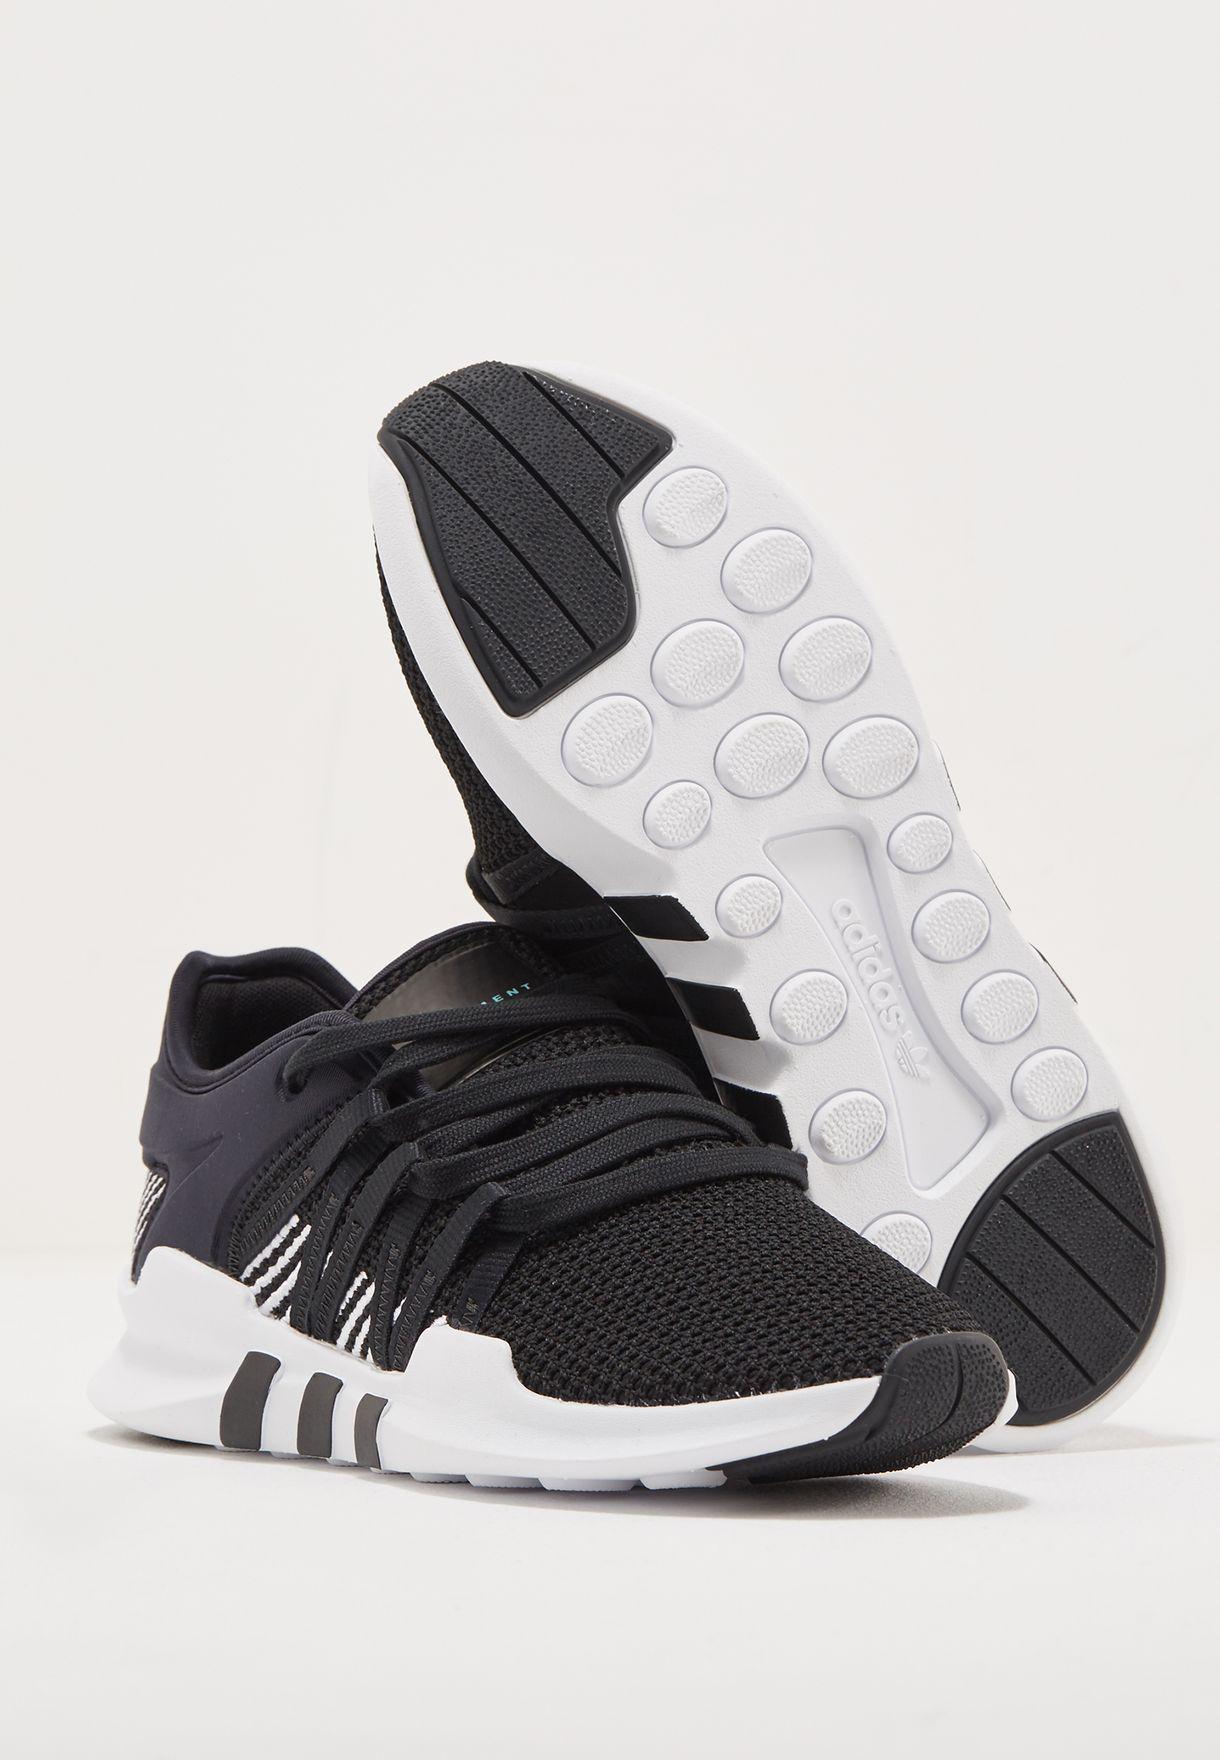 adidas EQT Racing Adv Women Shoes Black BY9795